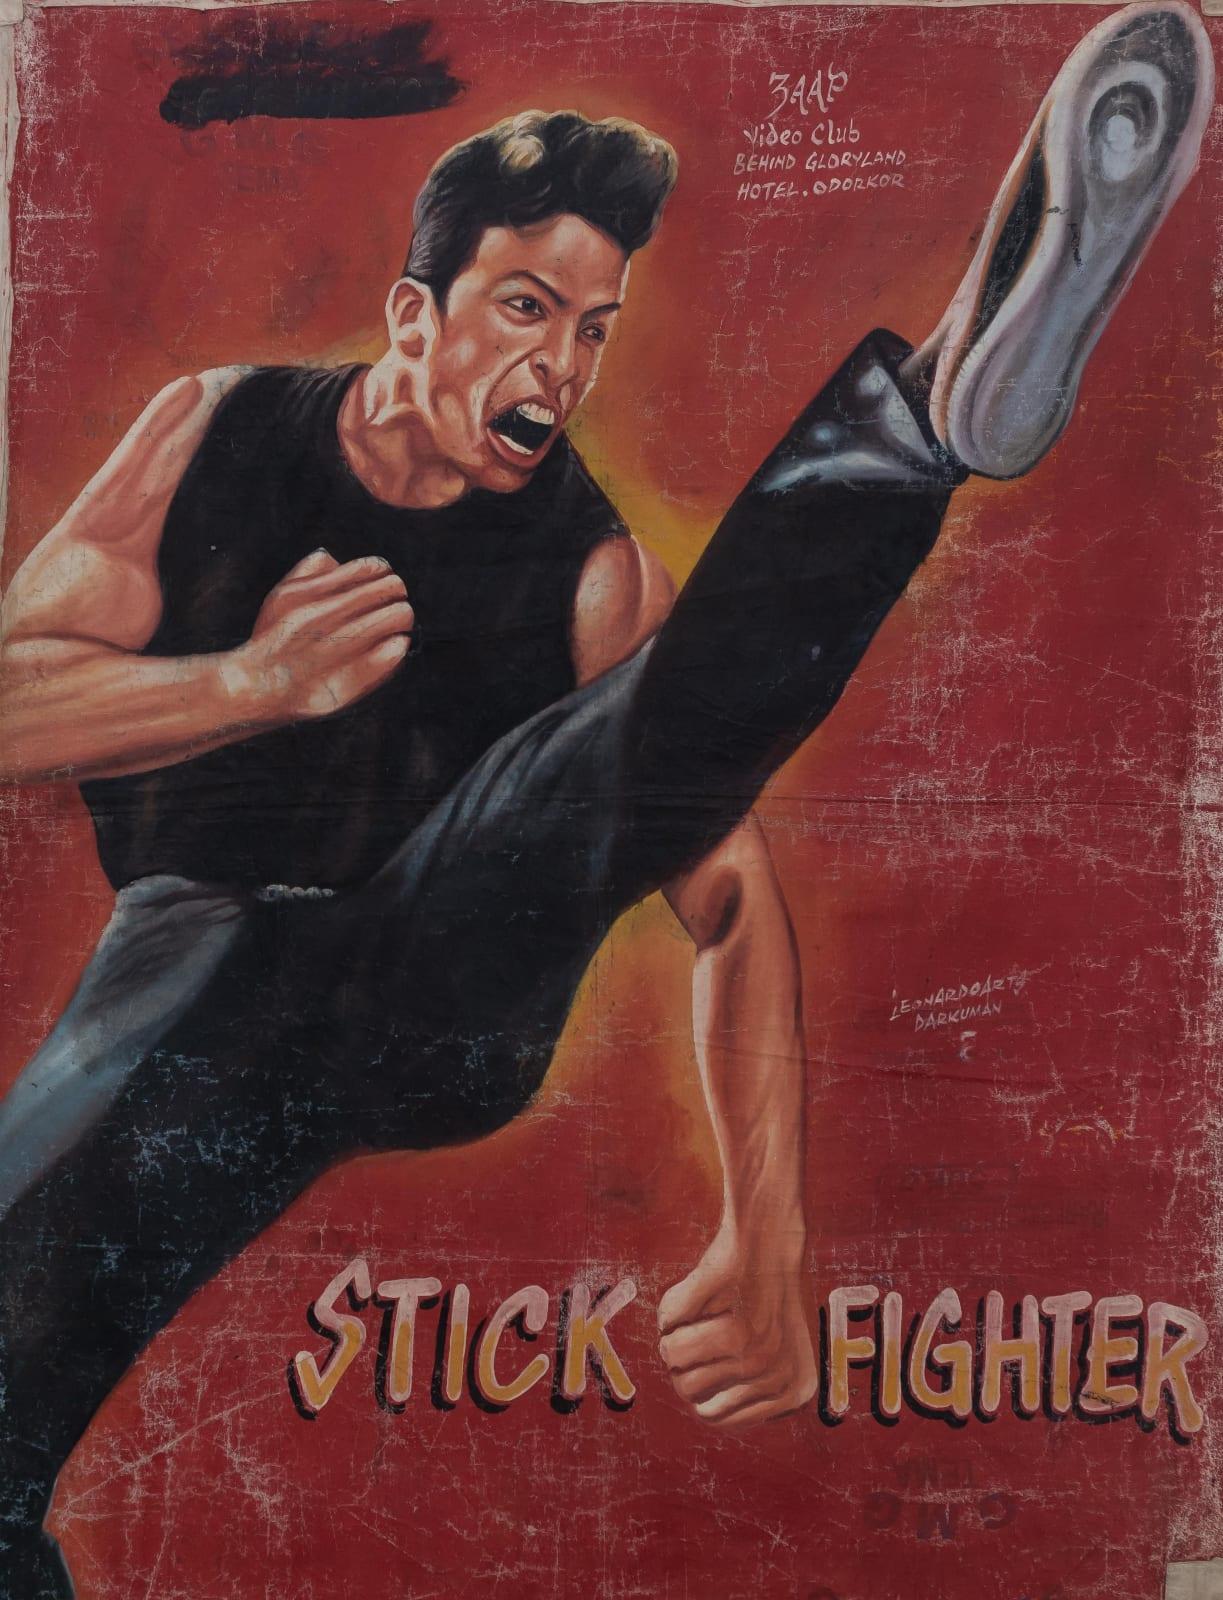 Stick Fighter 147 x 114 cm